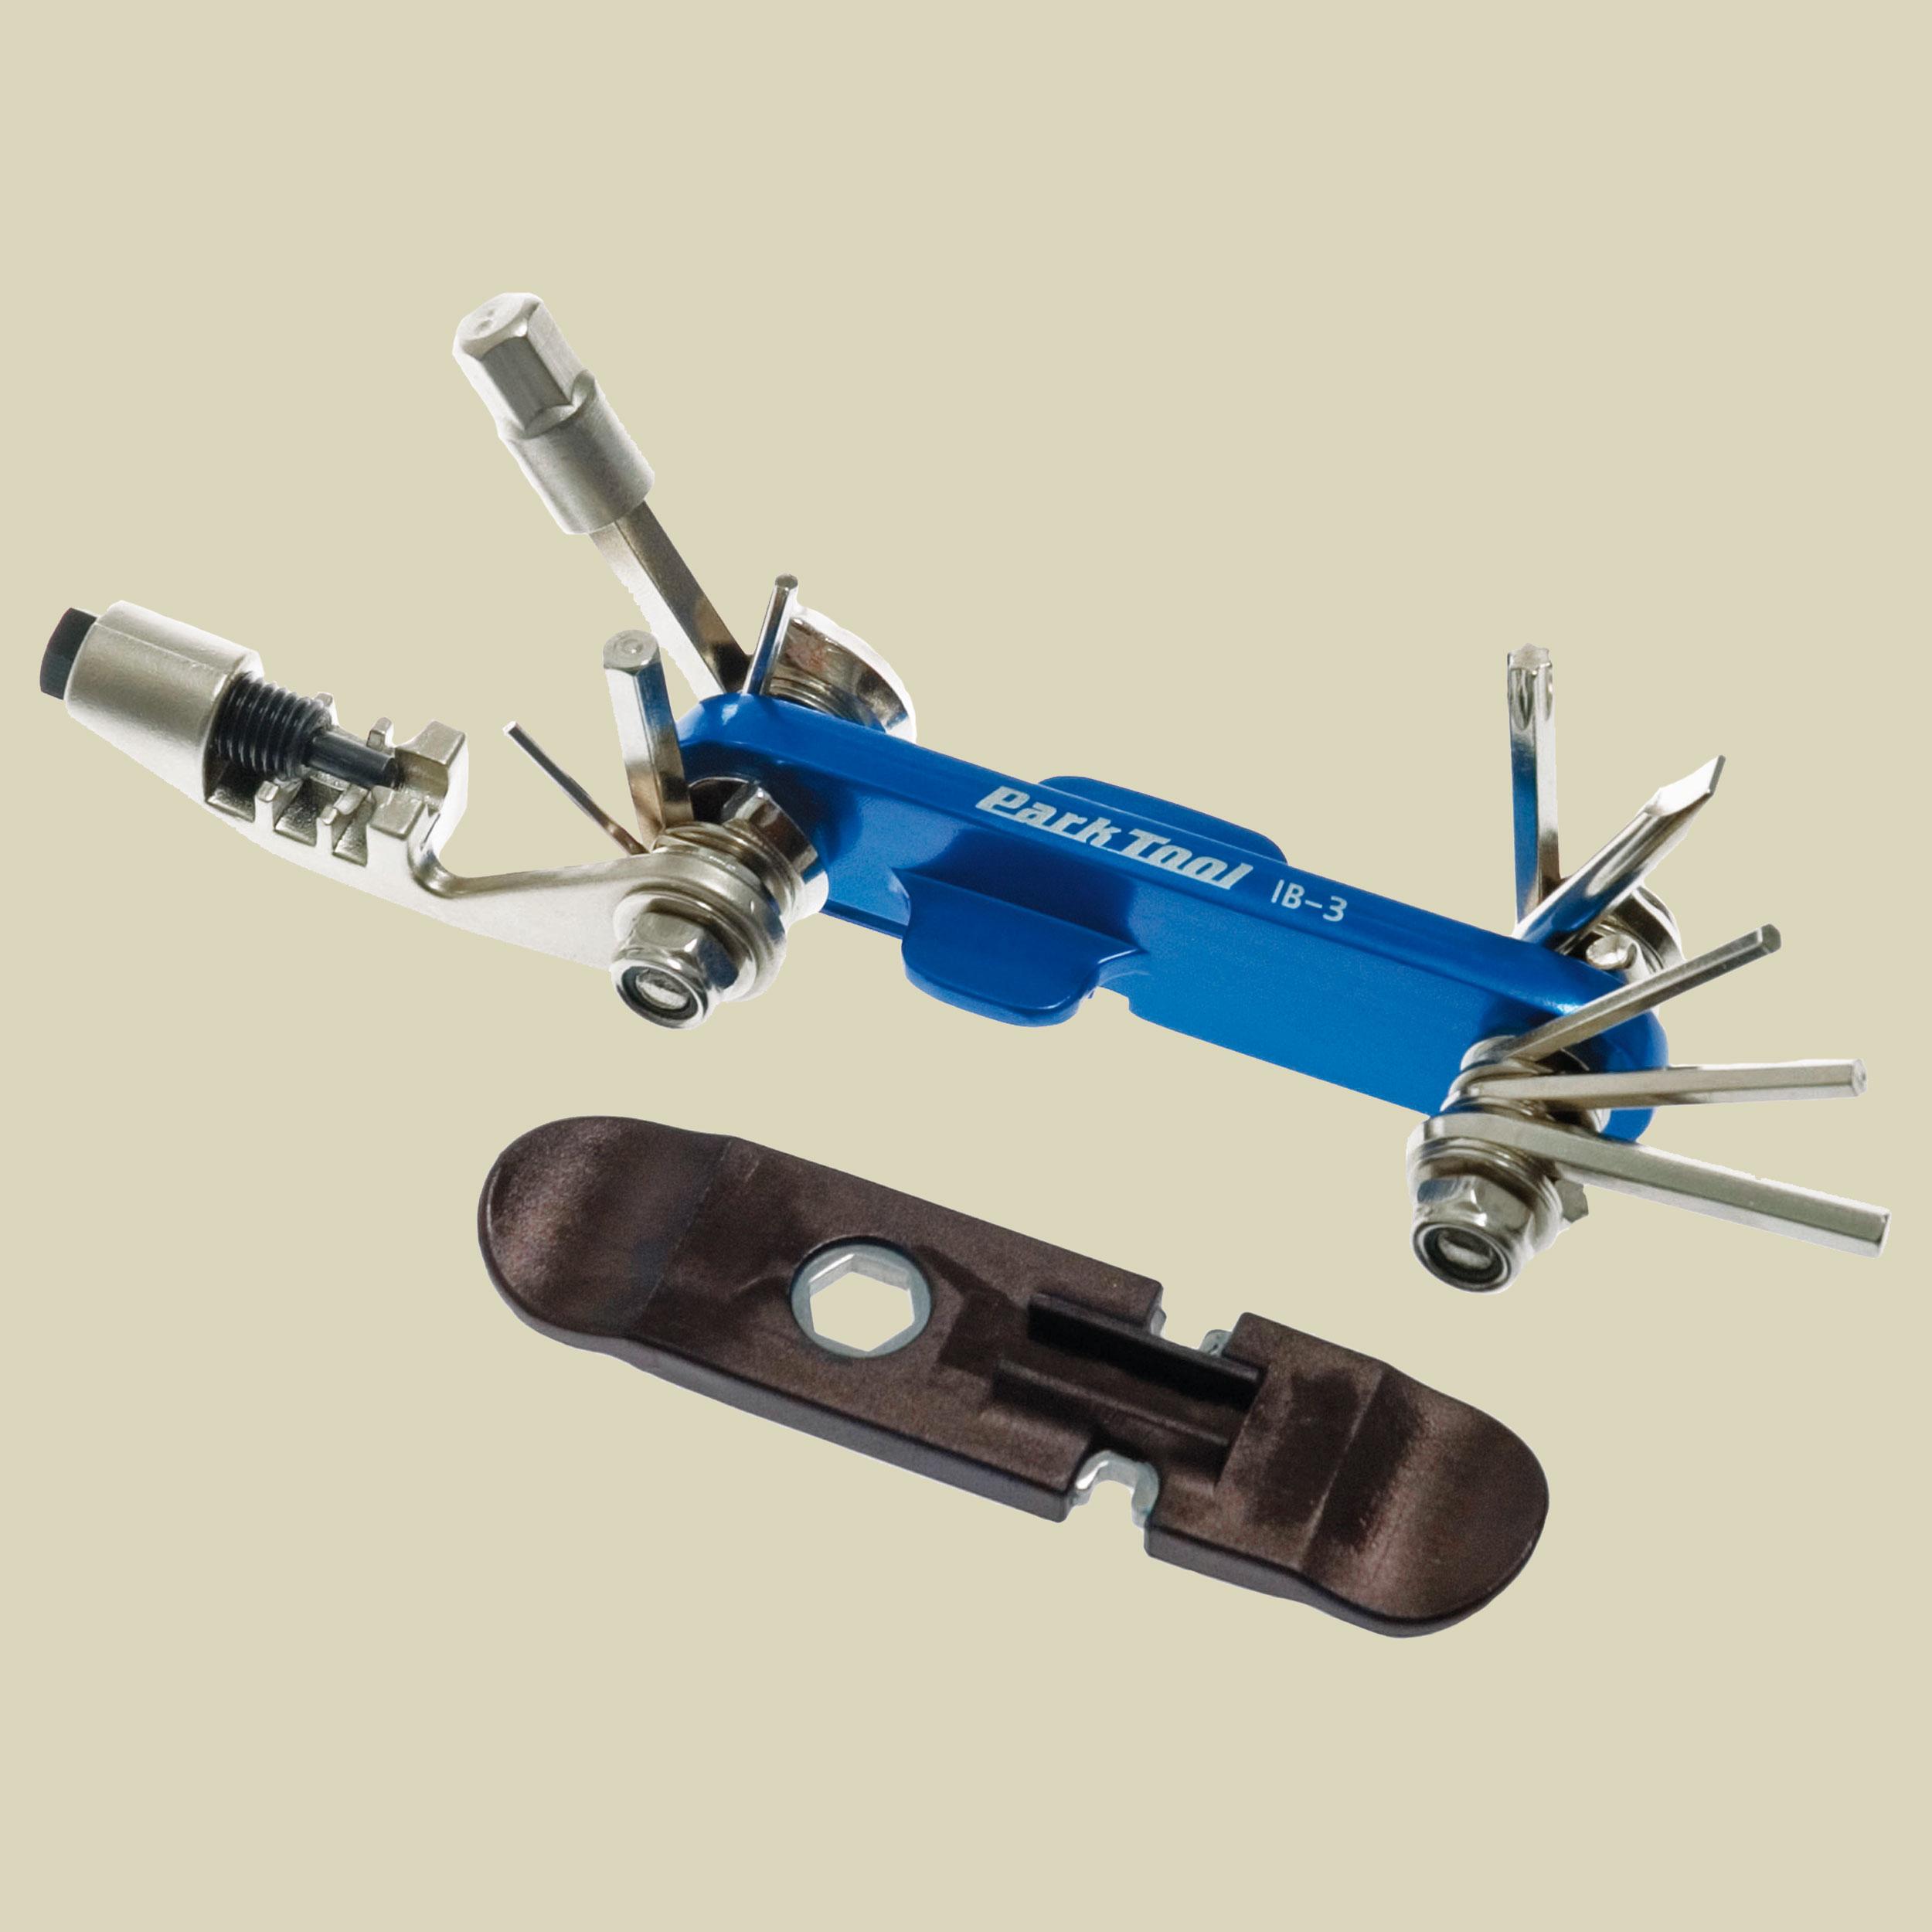 Park Tool IB-3C Mini-Faltwerkzeug I-Beam  Mini-Faltwerkzeug